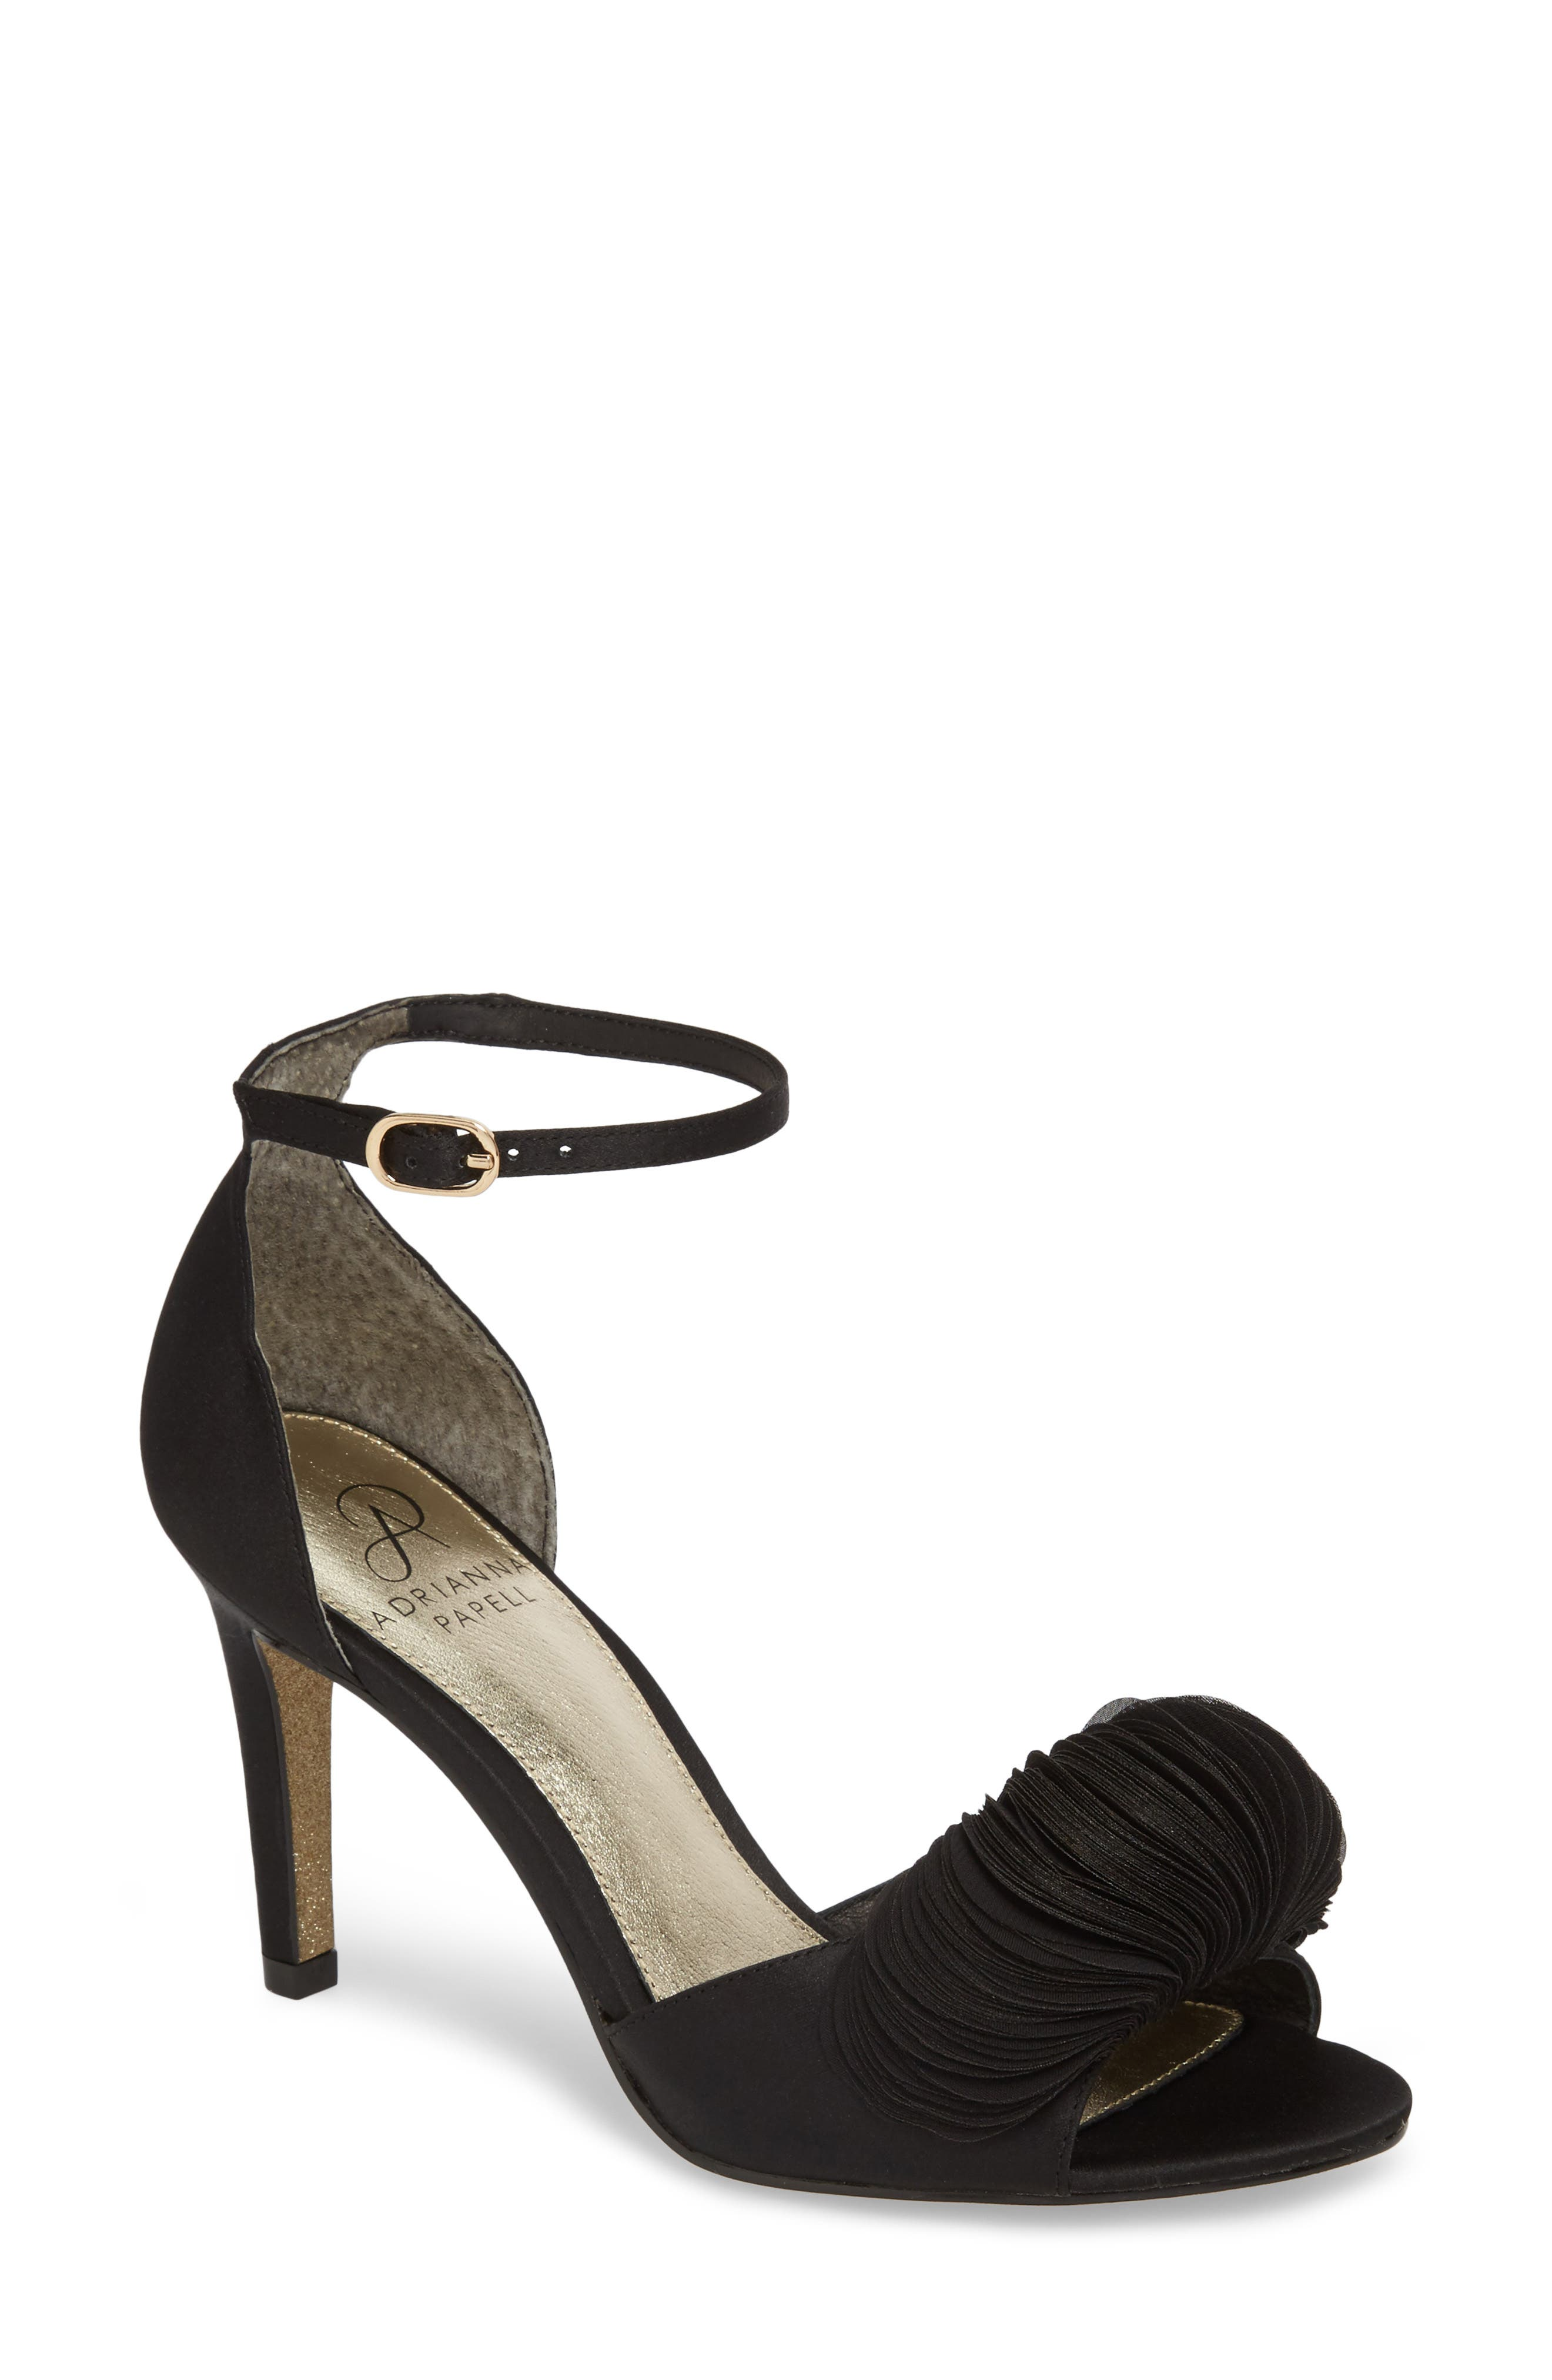 Gracie Ankle Strap Sandal,                             Main thumbnail 1, color,                             BLACK FABRIC